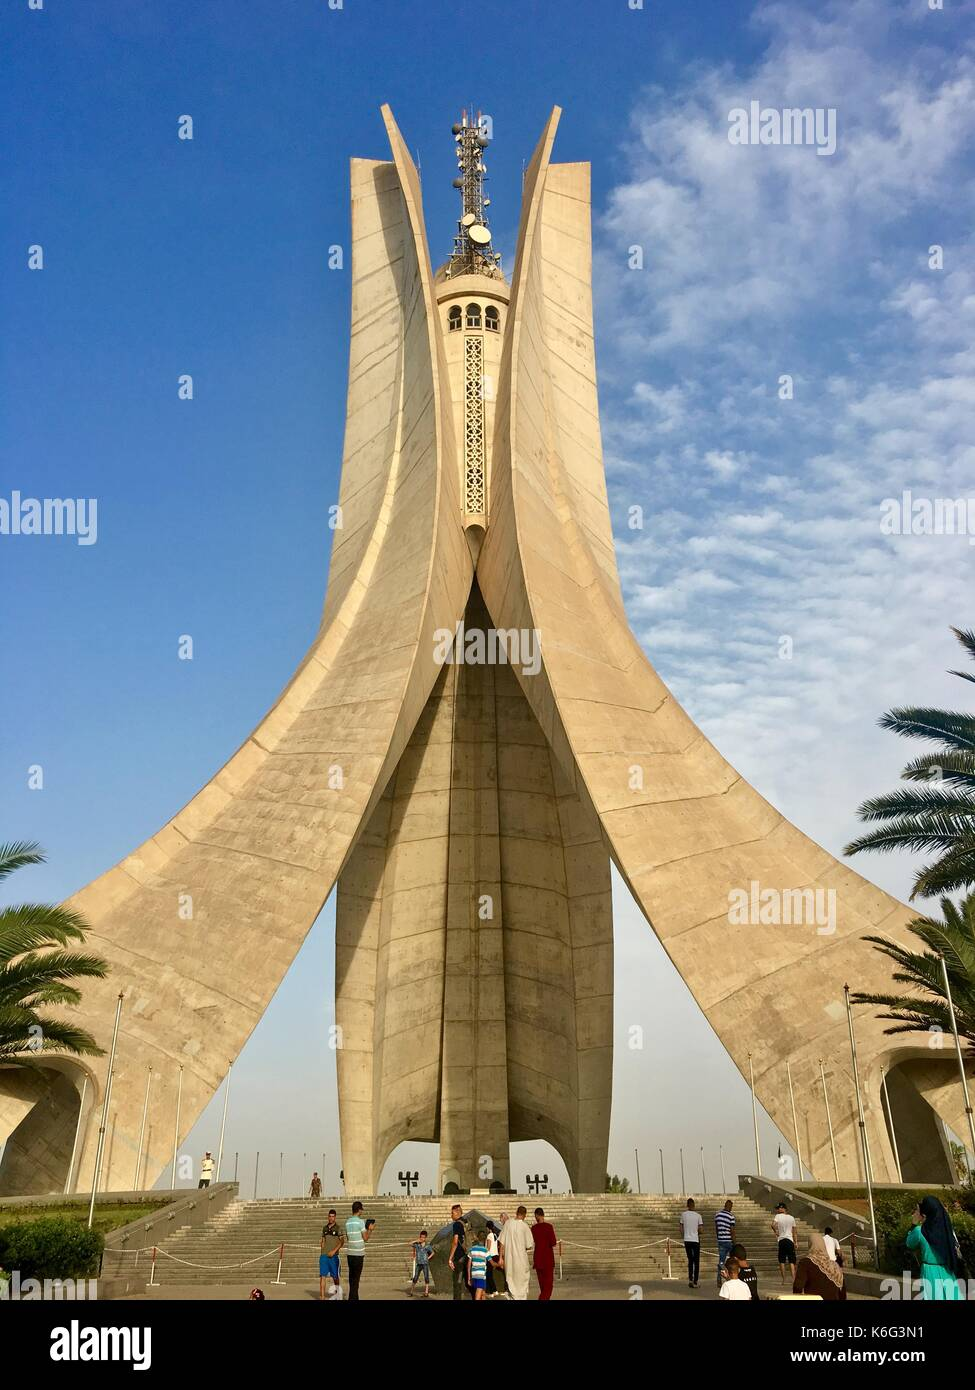 Maqam Echahid |Makam Echahid in Algiers |Algiers |Diary Store